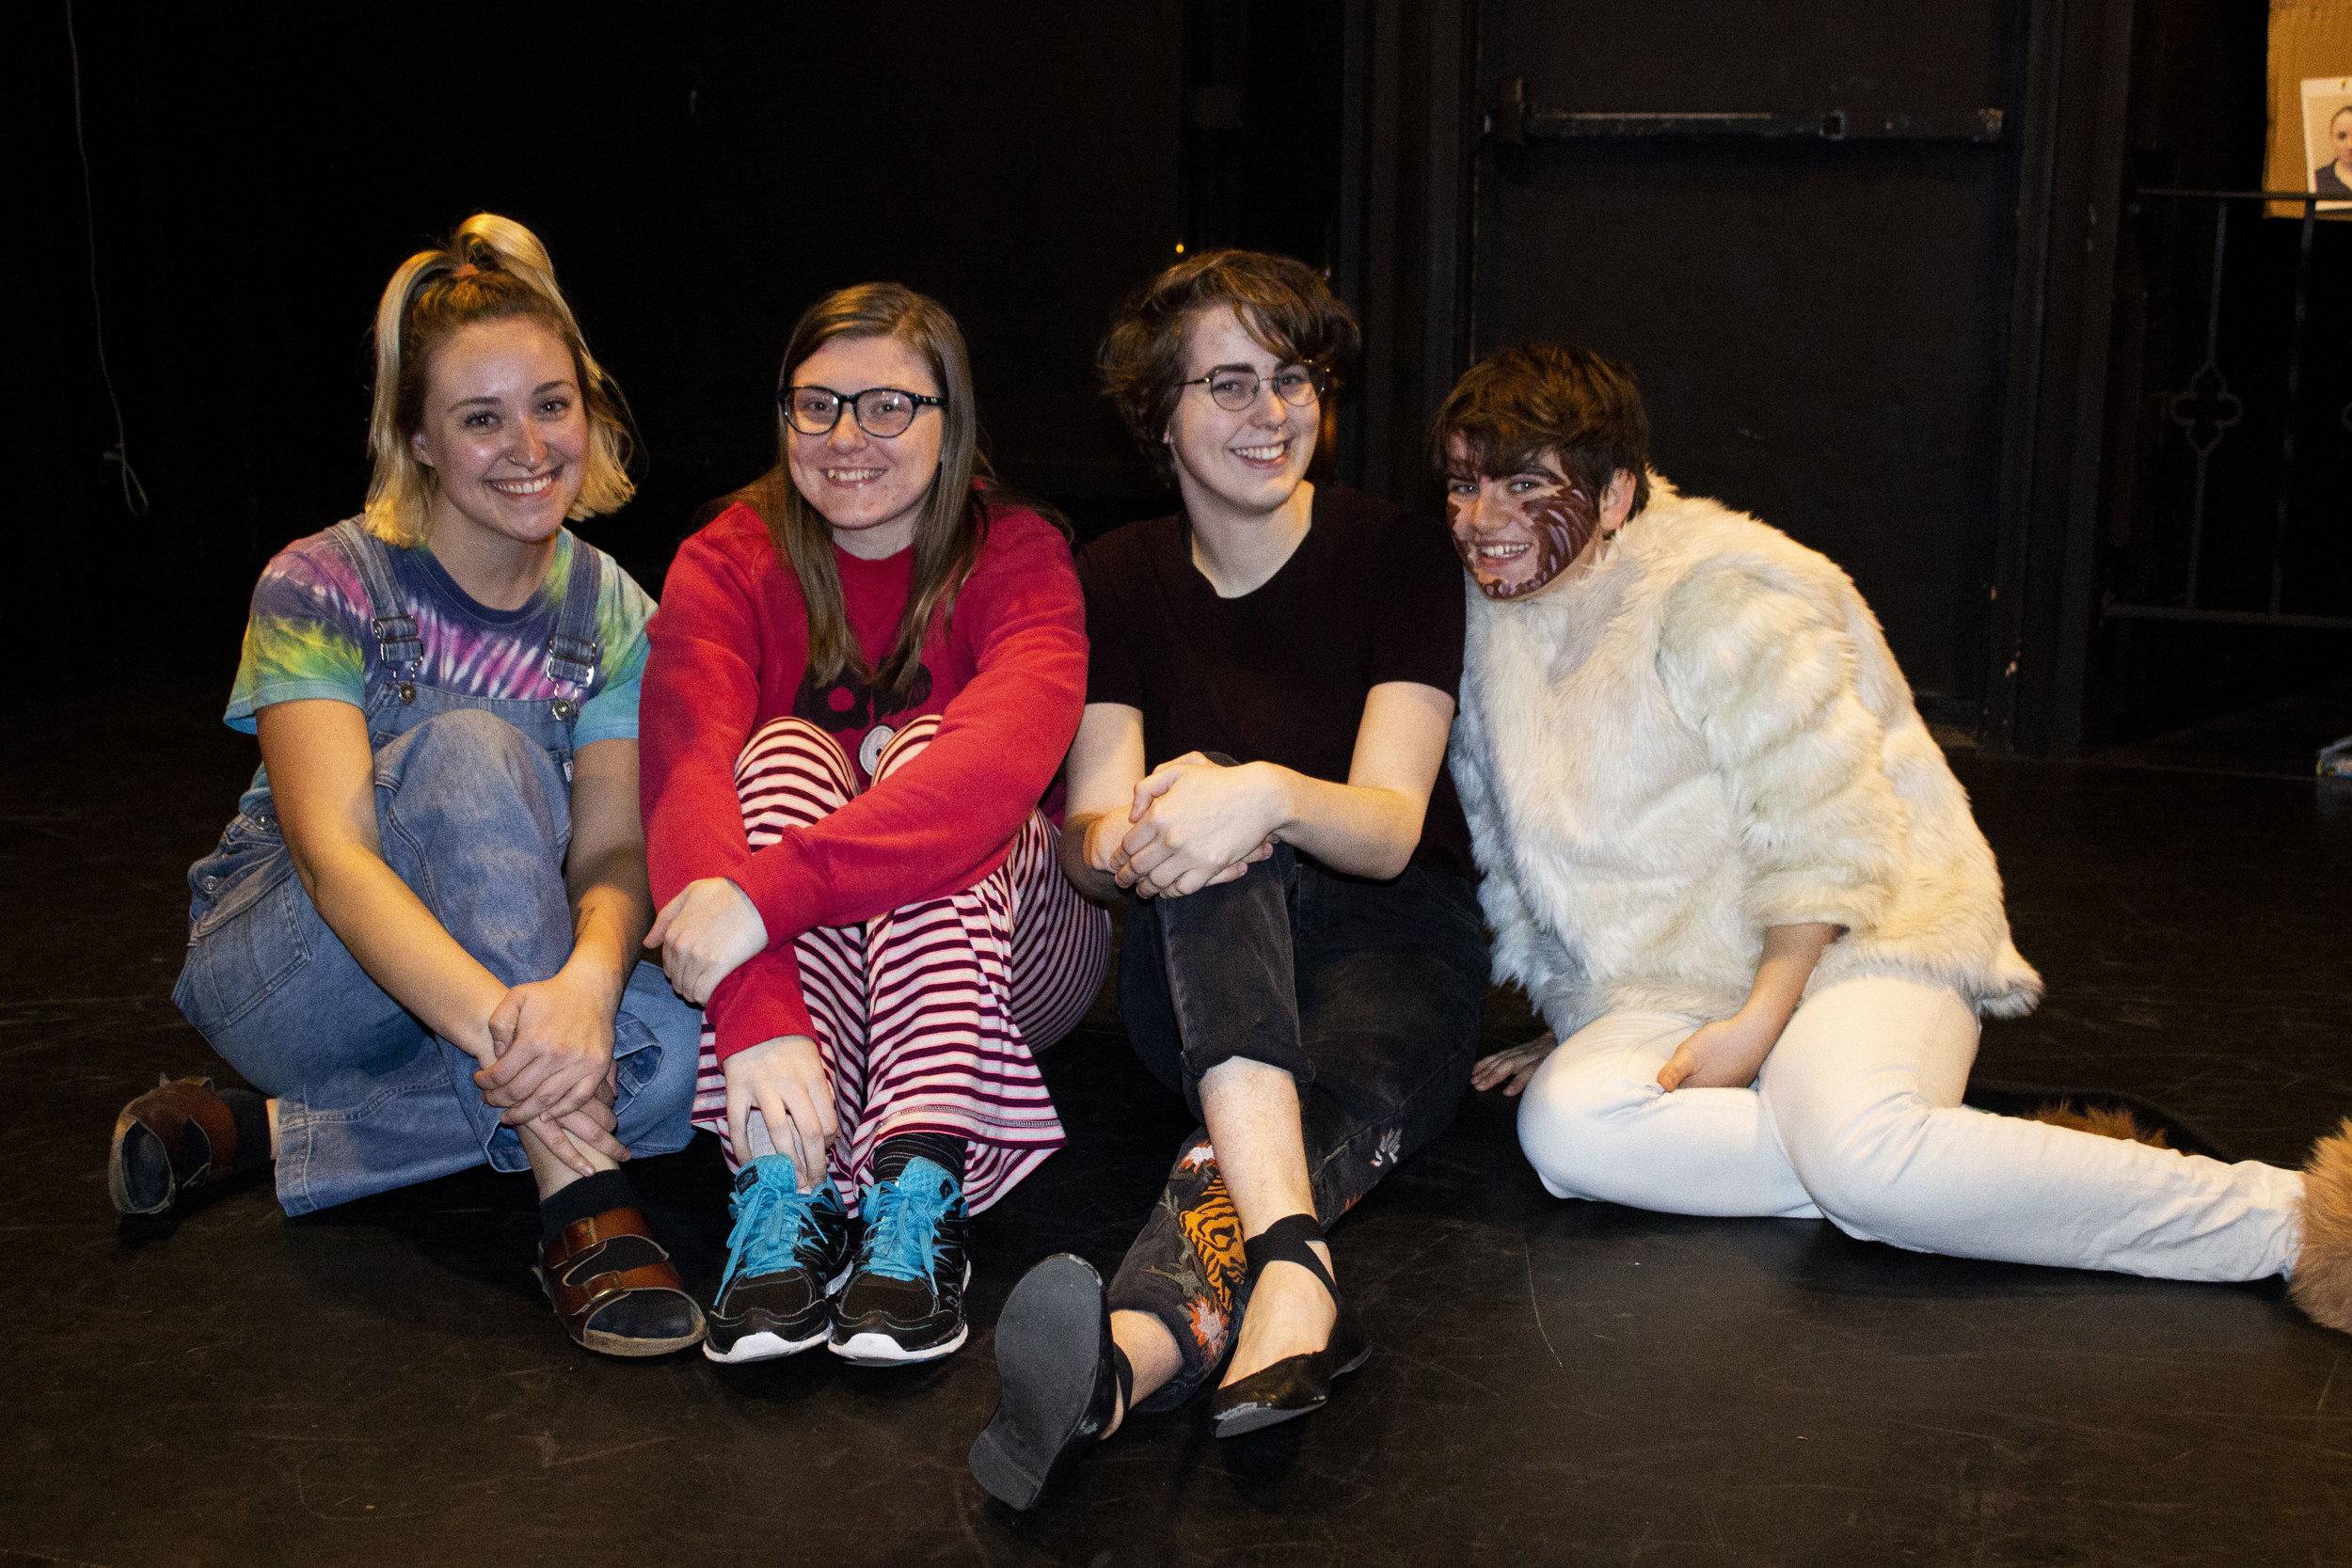 Photo by Jenny Reierson-Naumann   from left to right: Rachel Chevremont, Erin Cargill, Erika Bloomdahl, and Beth Ann Powers